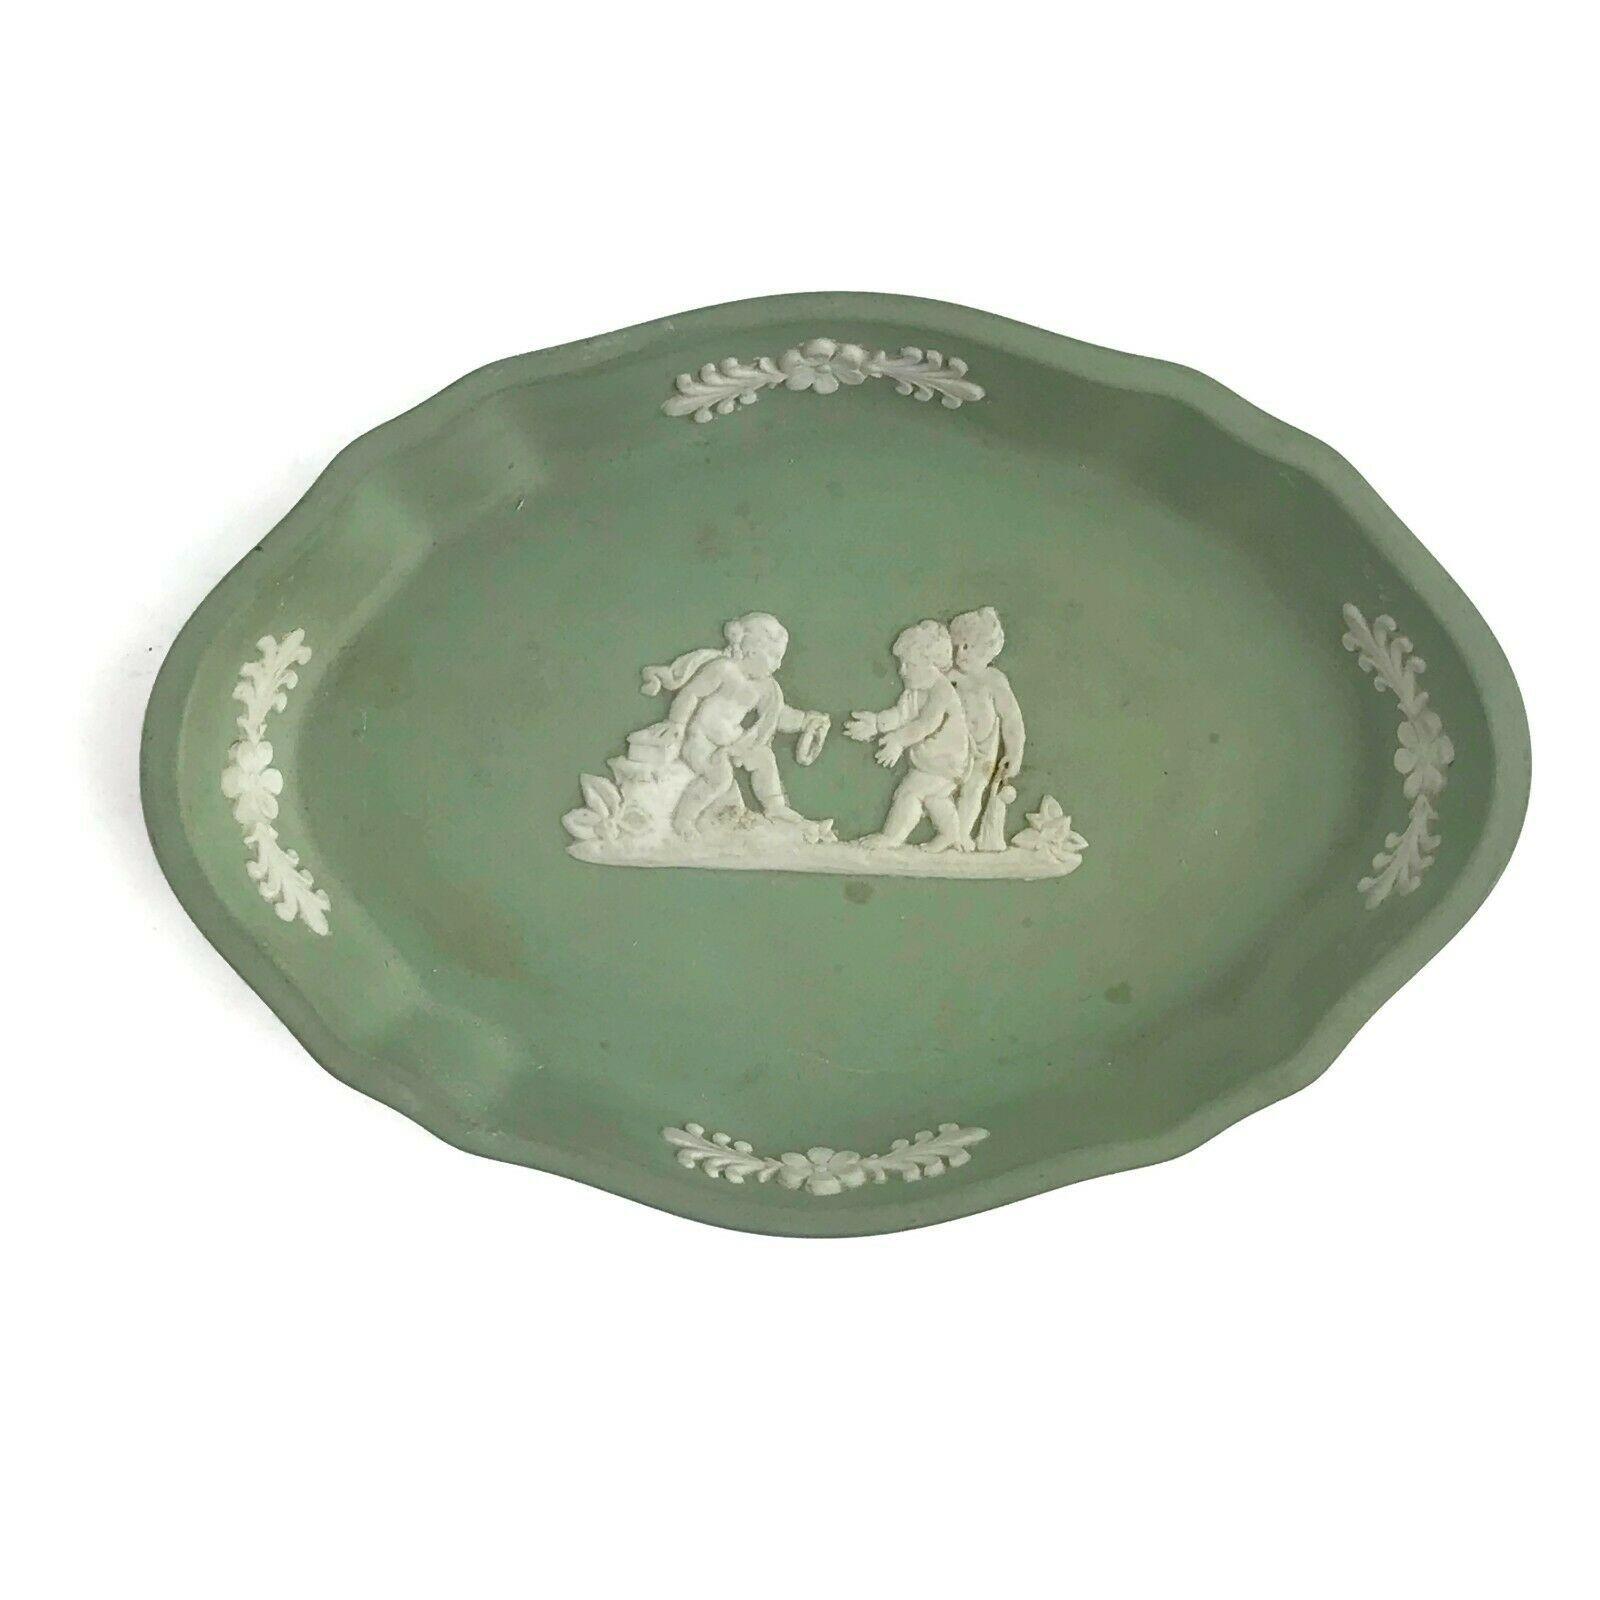 "Vintage Wedgwood England Blue Jasperware Sage Green Pin Tray Neoclassical 4""U7 - $18.55"